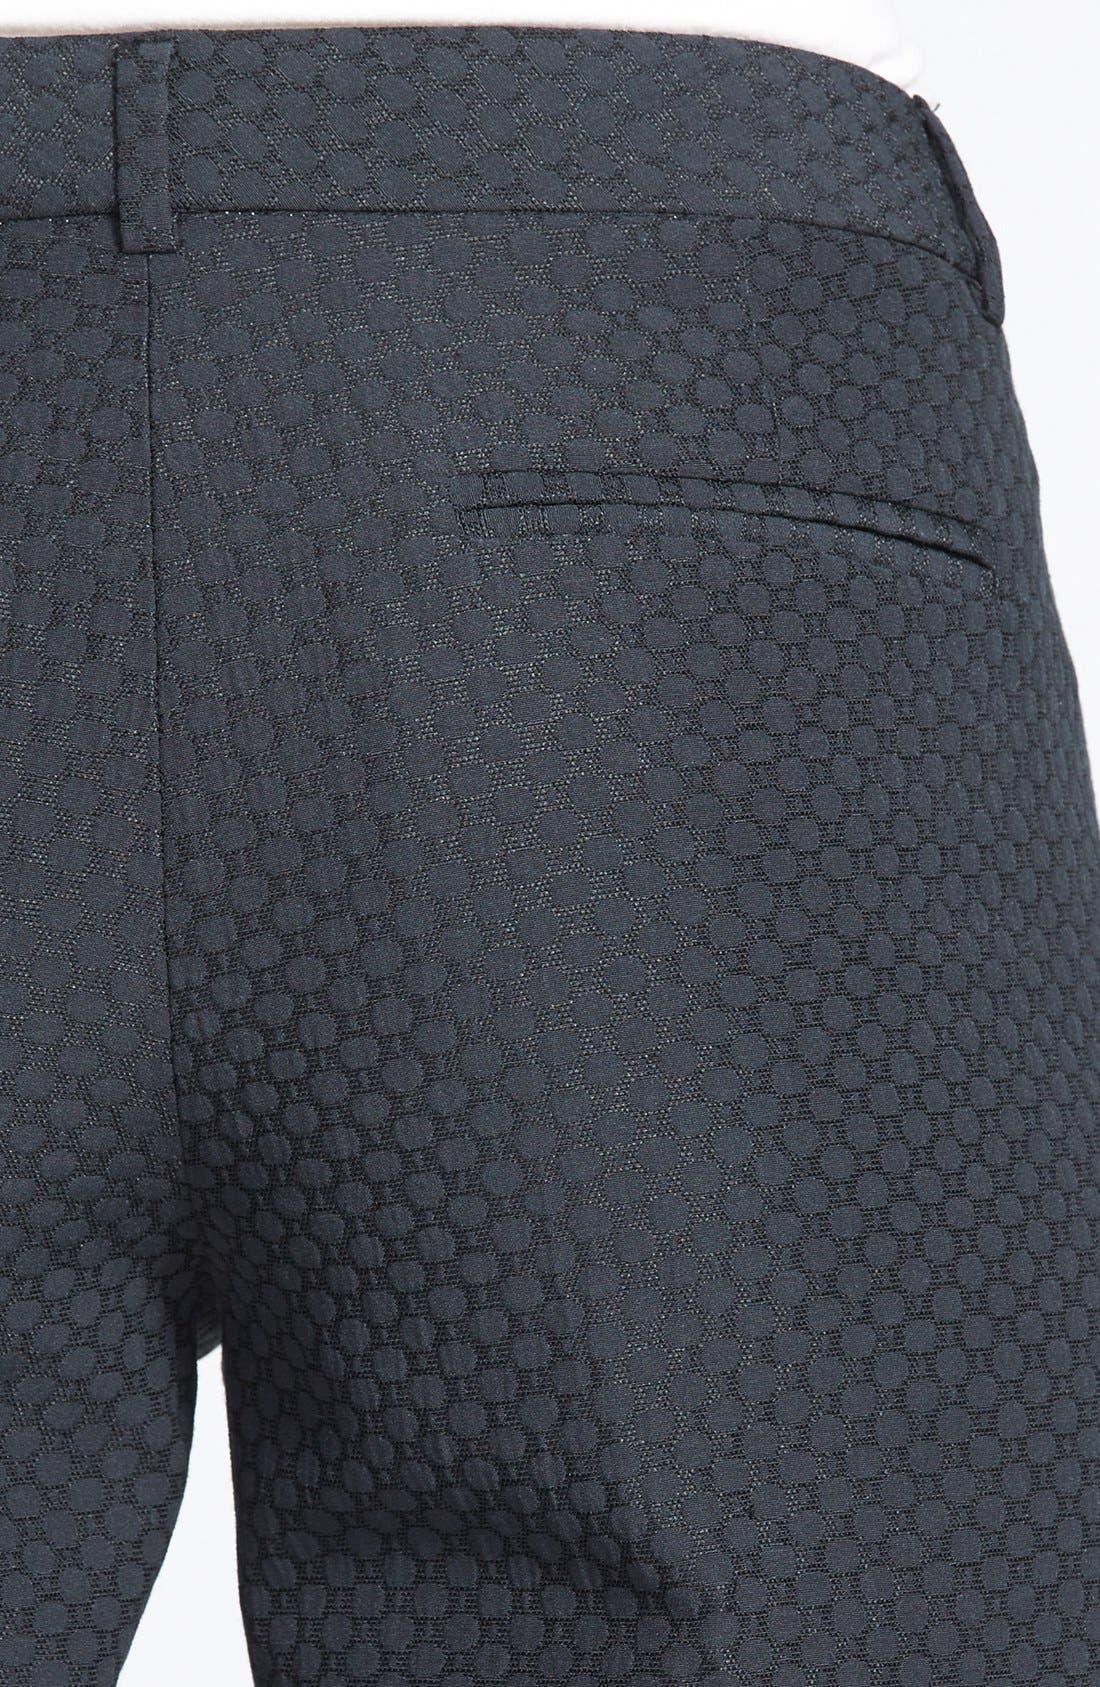 Alternate Image 3  - Chelsea28 Slim Jacquard Crop Pants